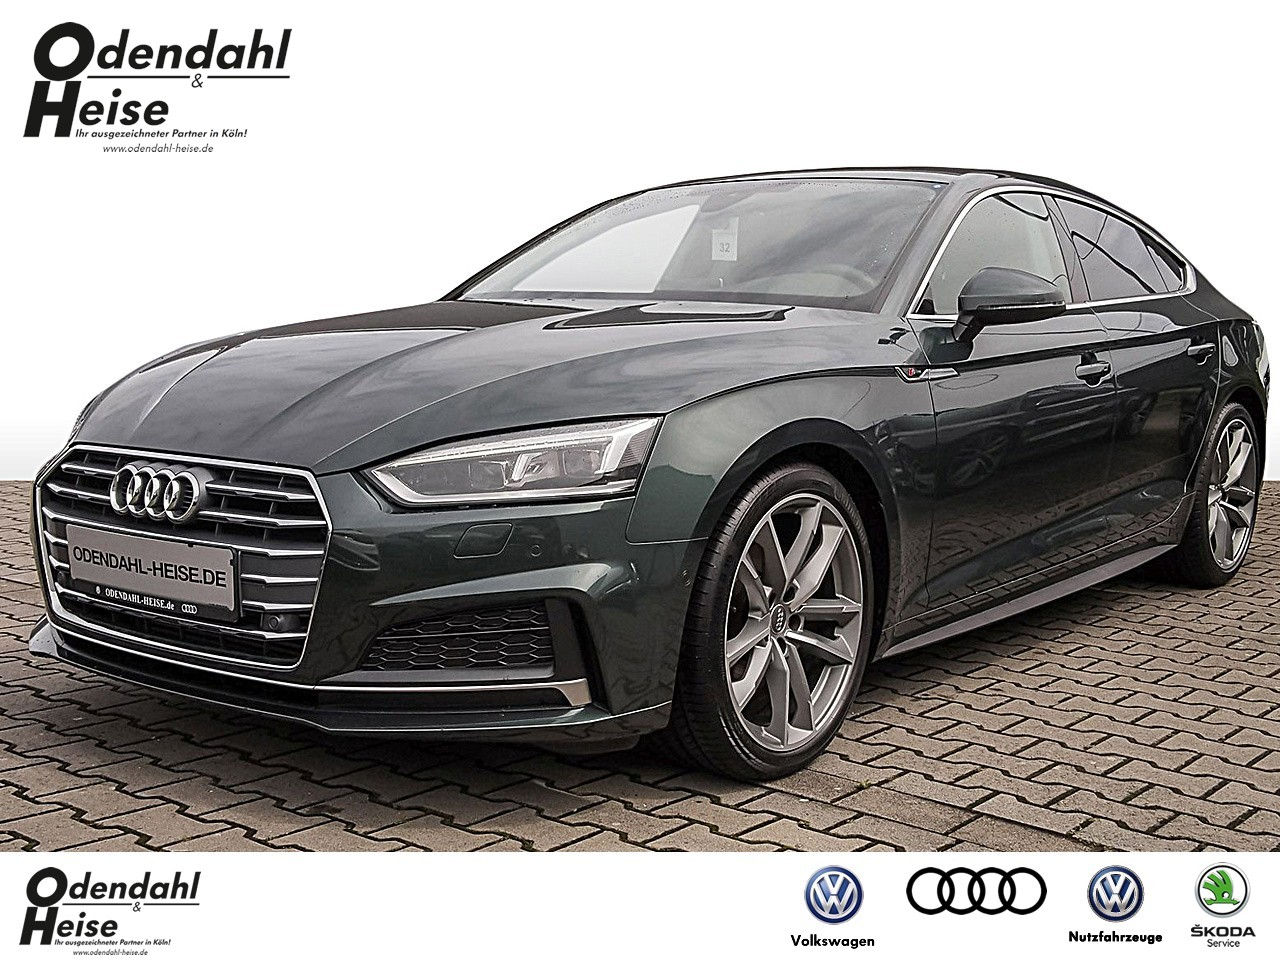 Audi A5 Sportback sport 2.0 TFSI S tronic Klima Navi, Jahr 2018, Benzin